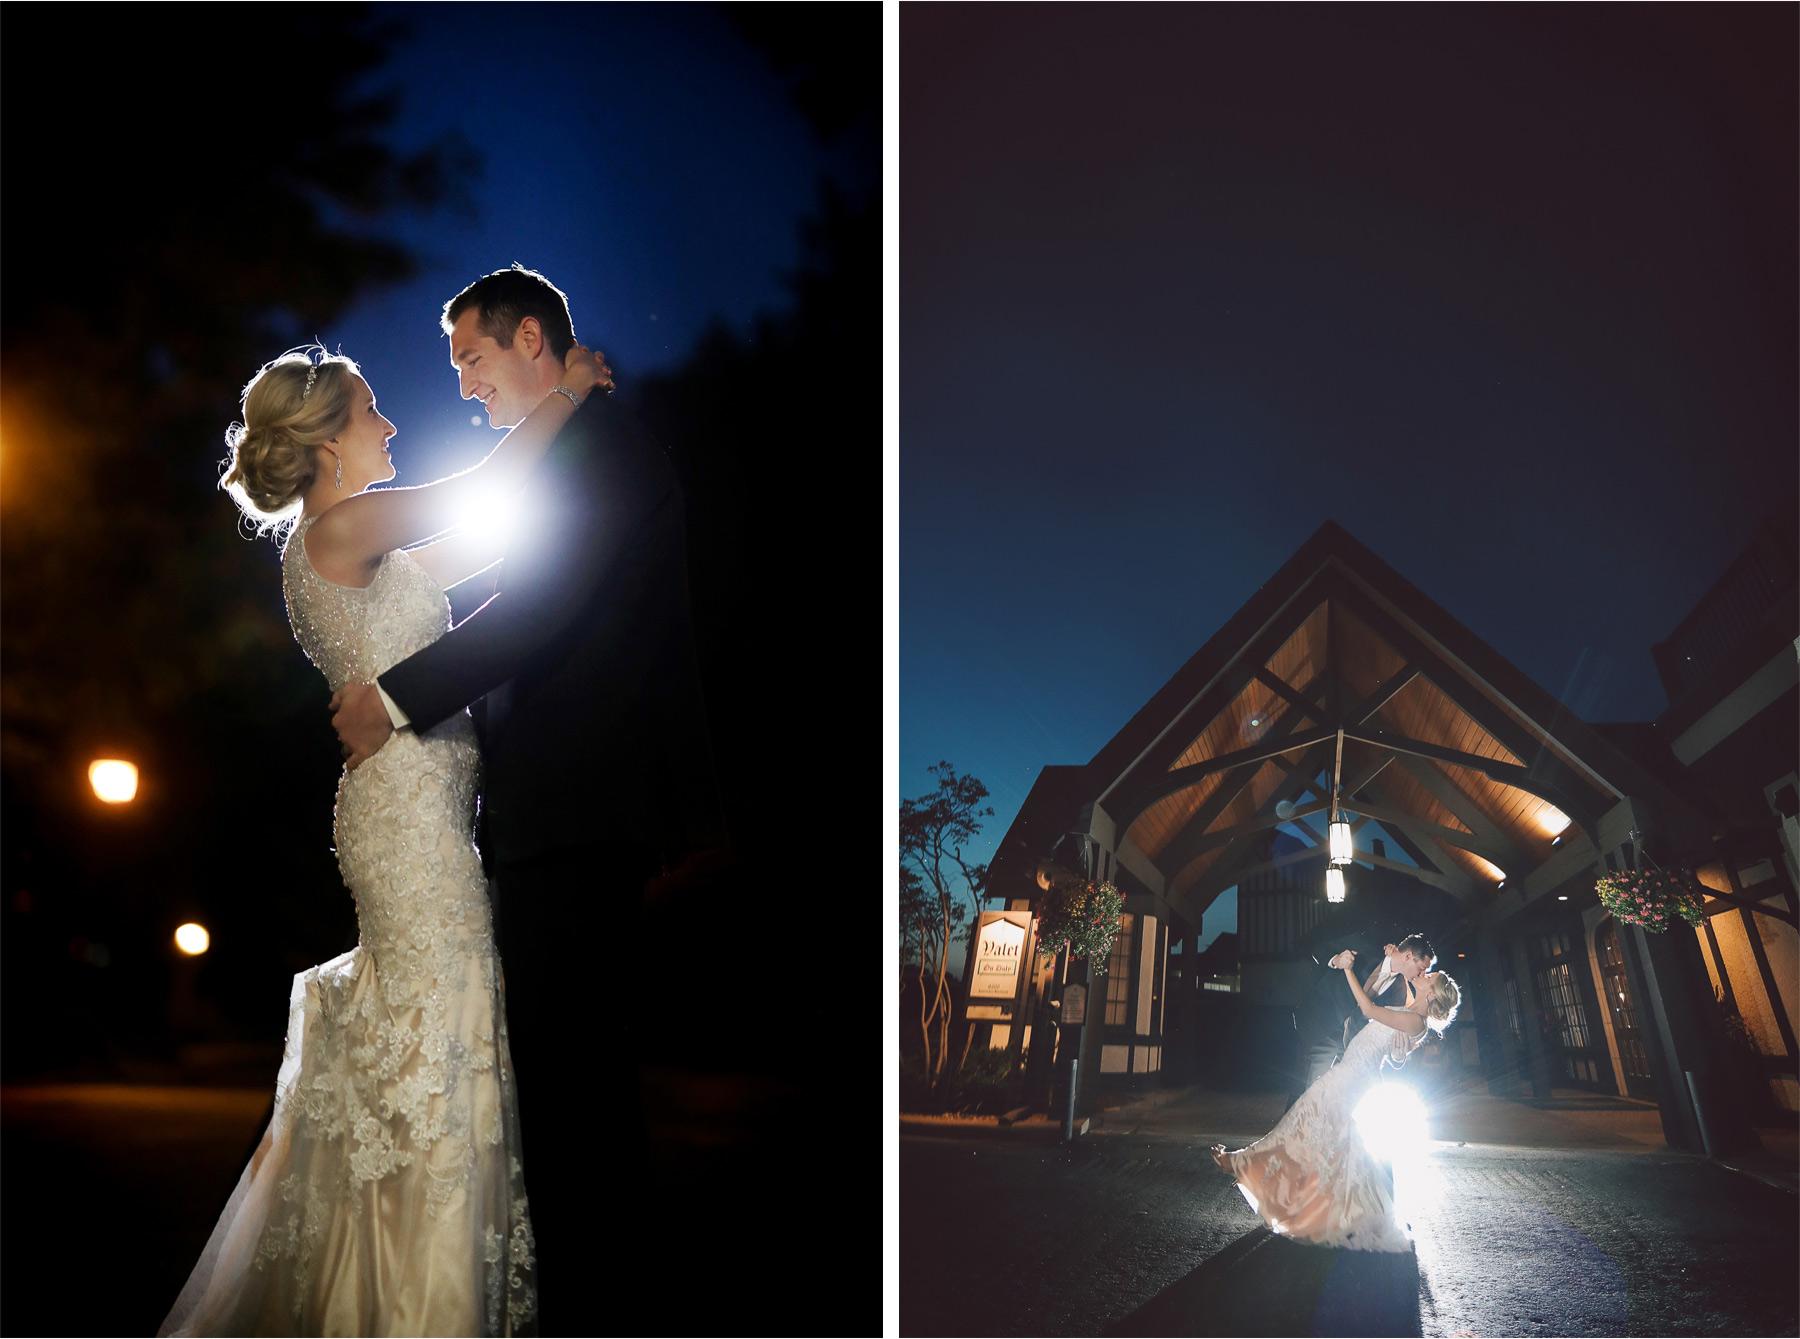 23-Minneapolis-Minnesota-Wedding-Photography-by-Vick-Photography-Golf-Course-Interlachen-Country-Club--Reception-Night-Photography-Jenna-and-Josh.jpg